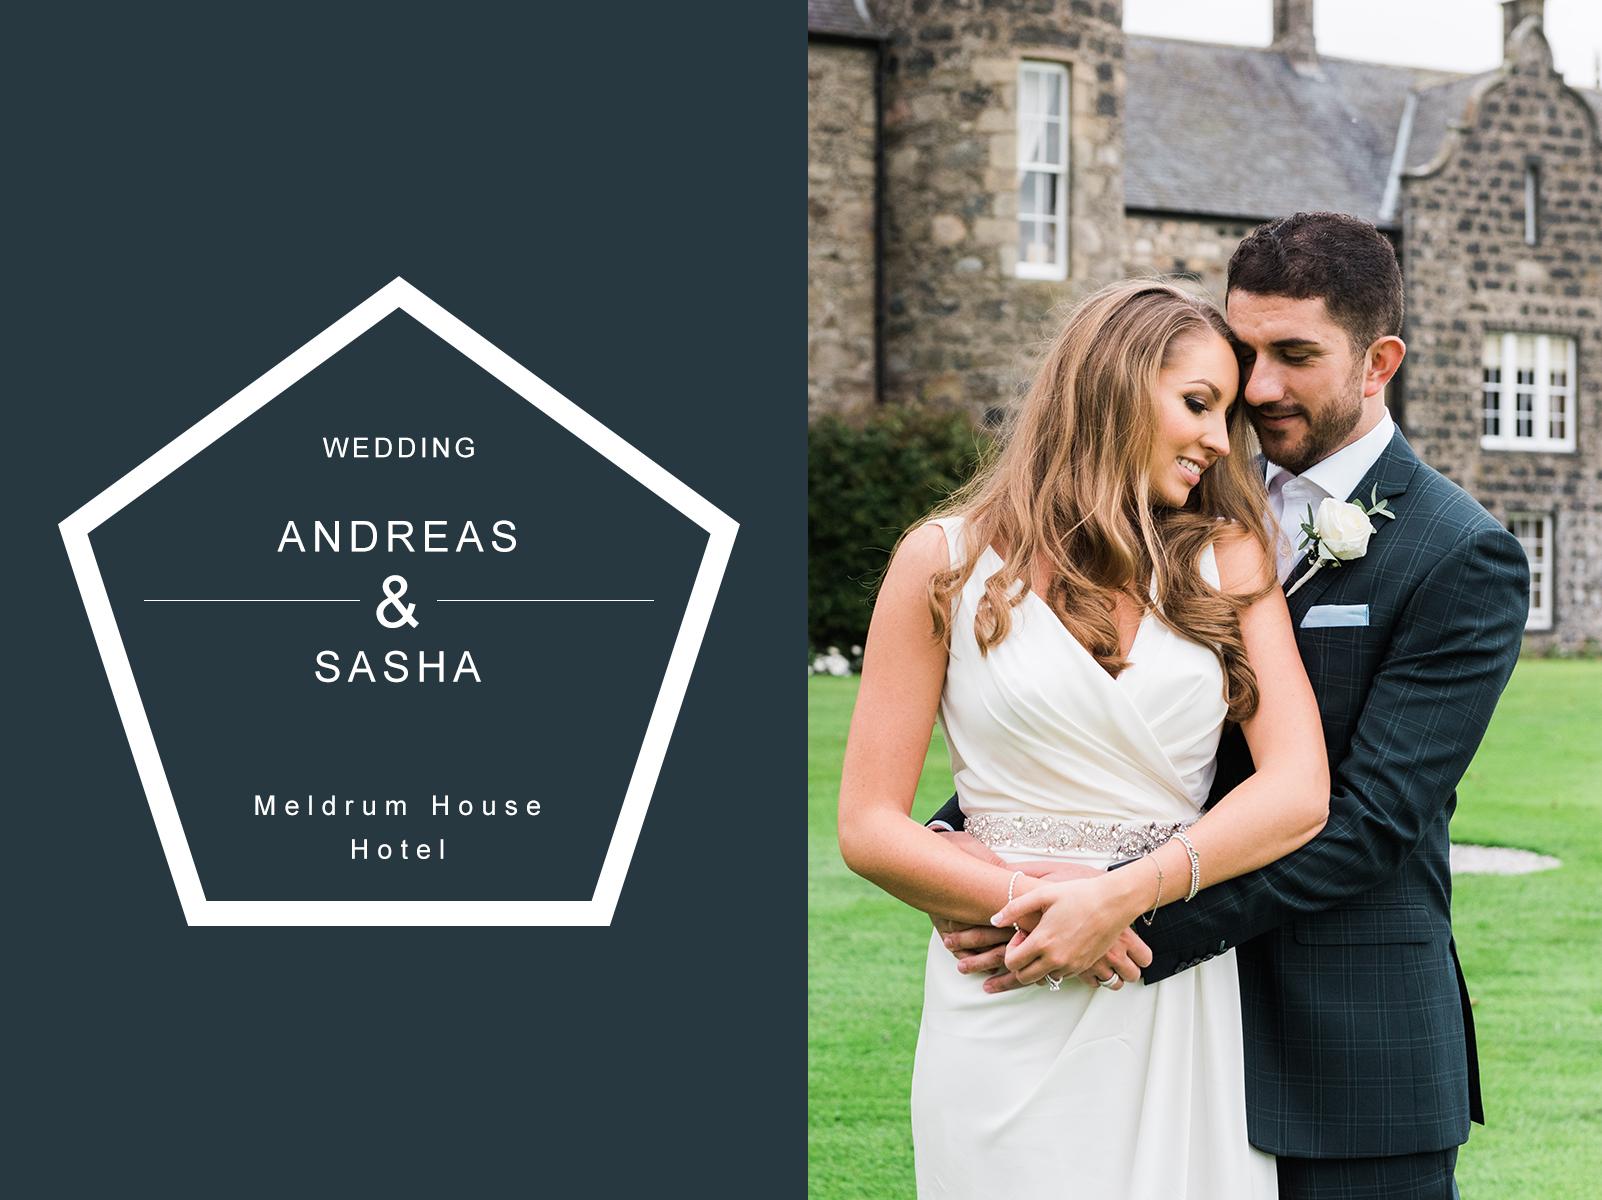 Wedding-Journal-Andreas-sasha.jpg